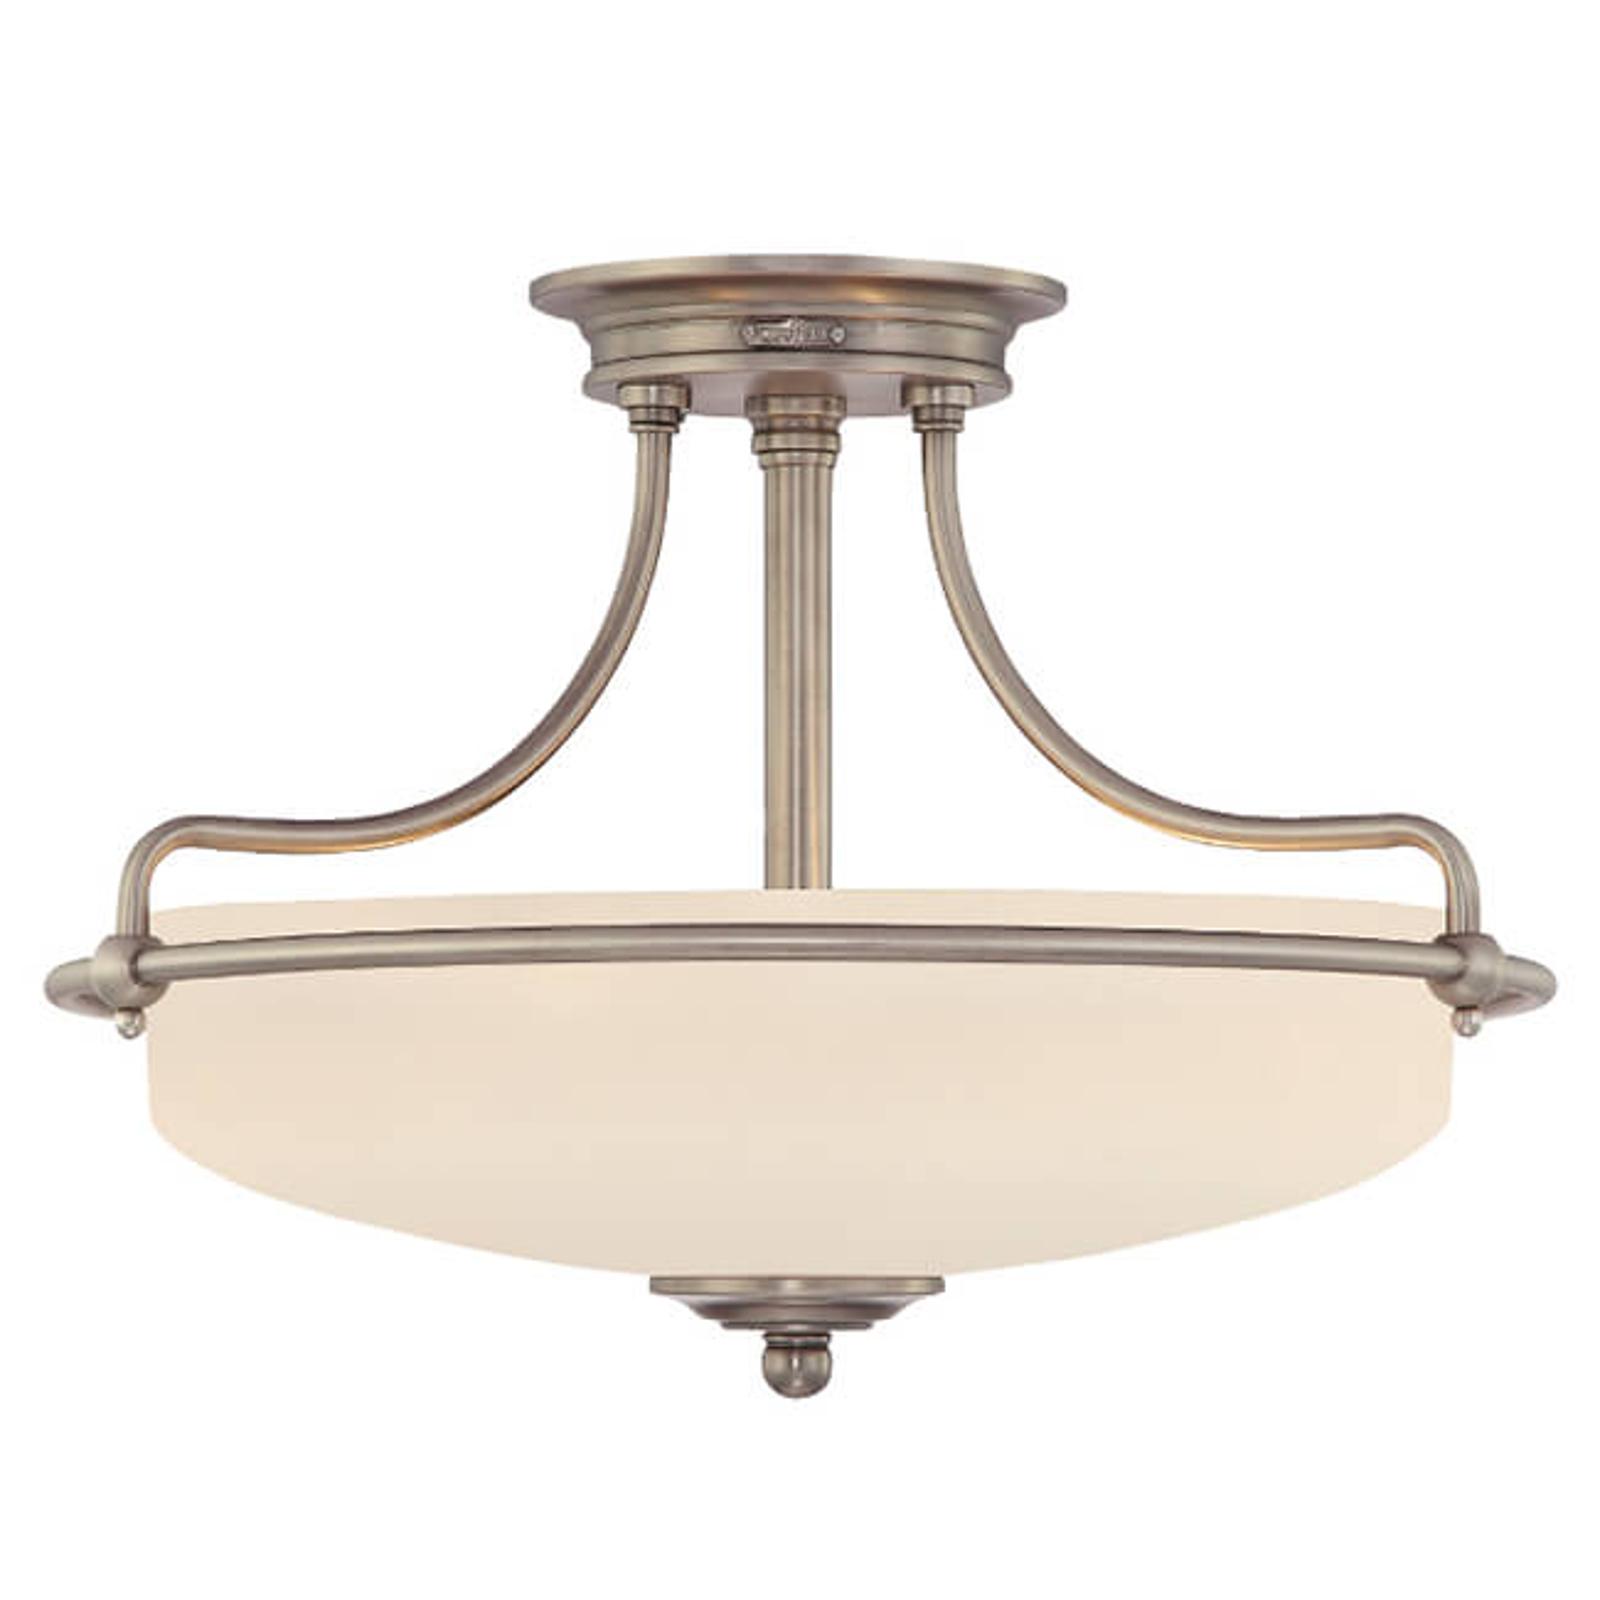 Plafondlamp Griffin, Ø 43 cm, nikkel antiek